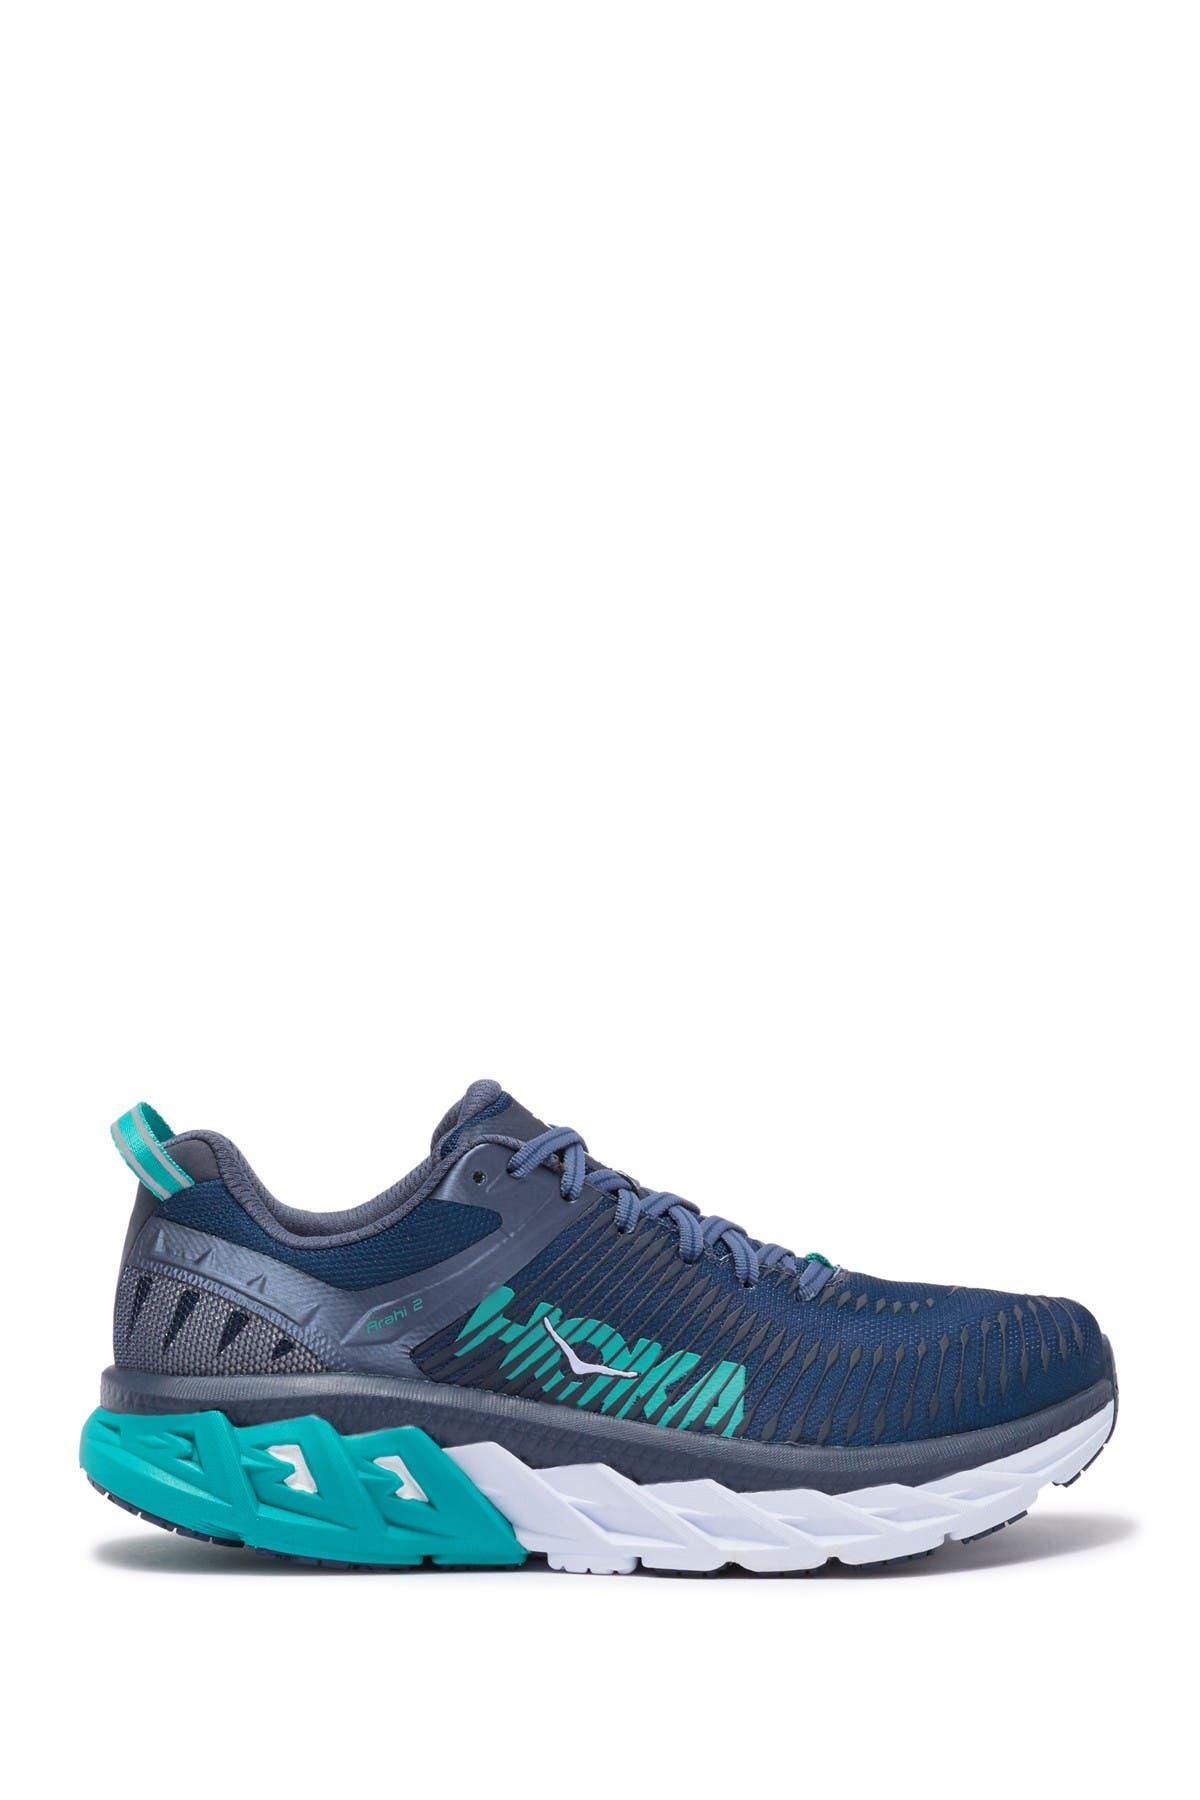 ONE | Arahi 2 Sneaker | Nordstrom Rack